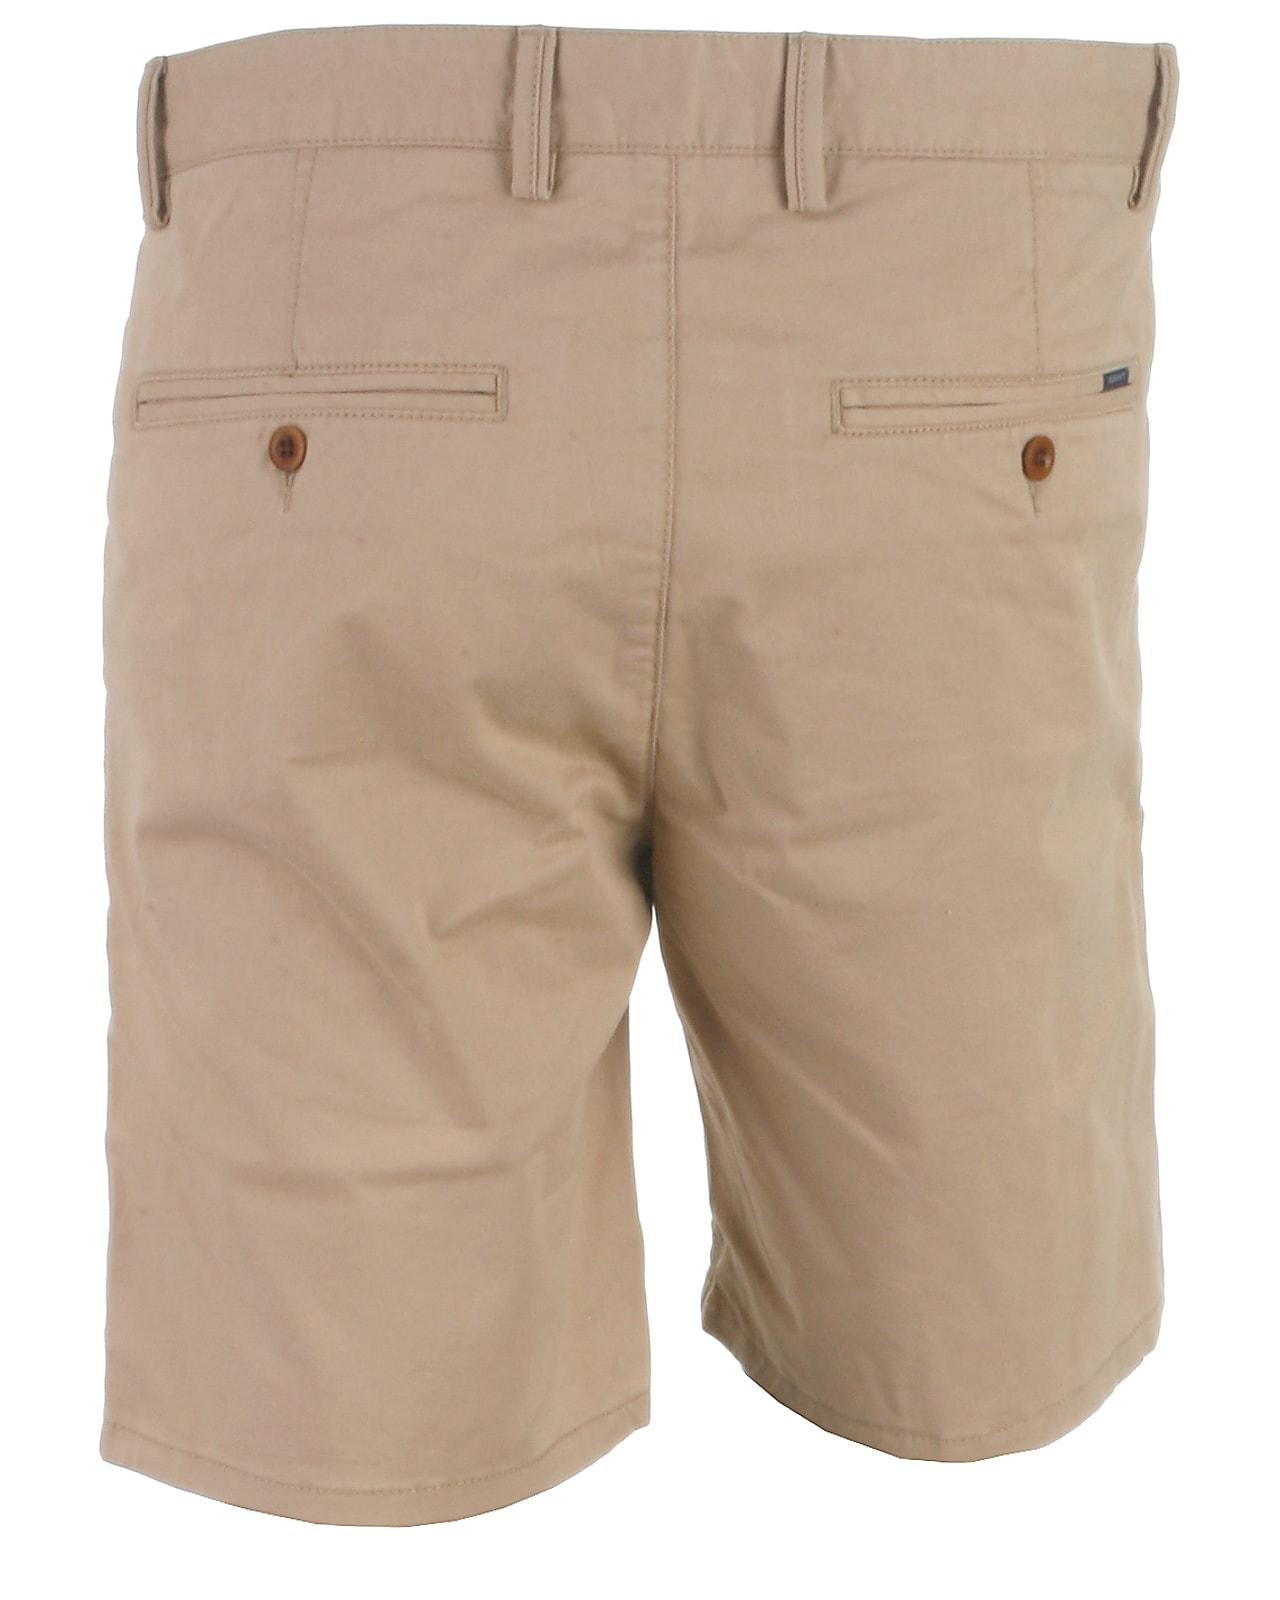 Image of Gant chino shorts, drysand